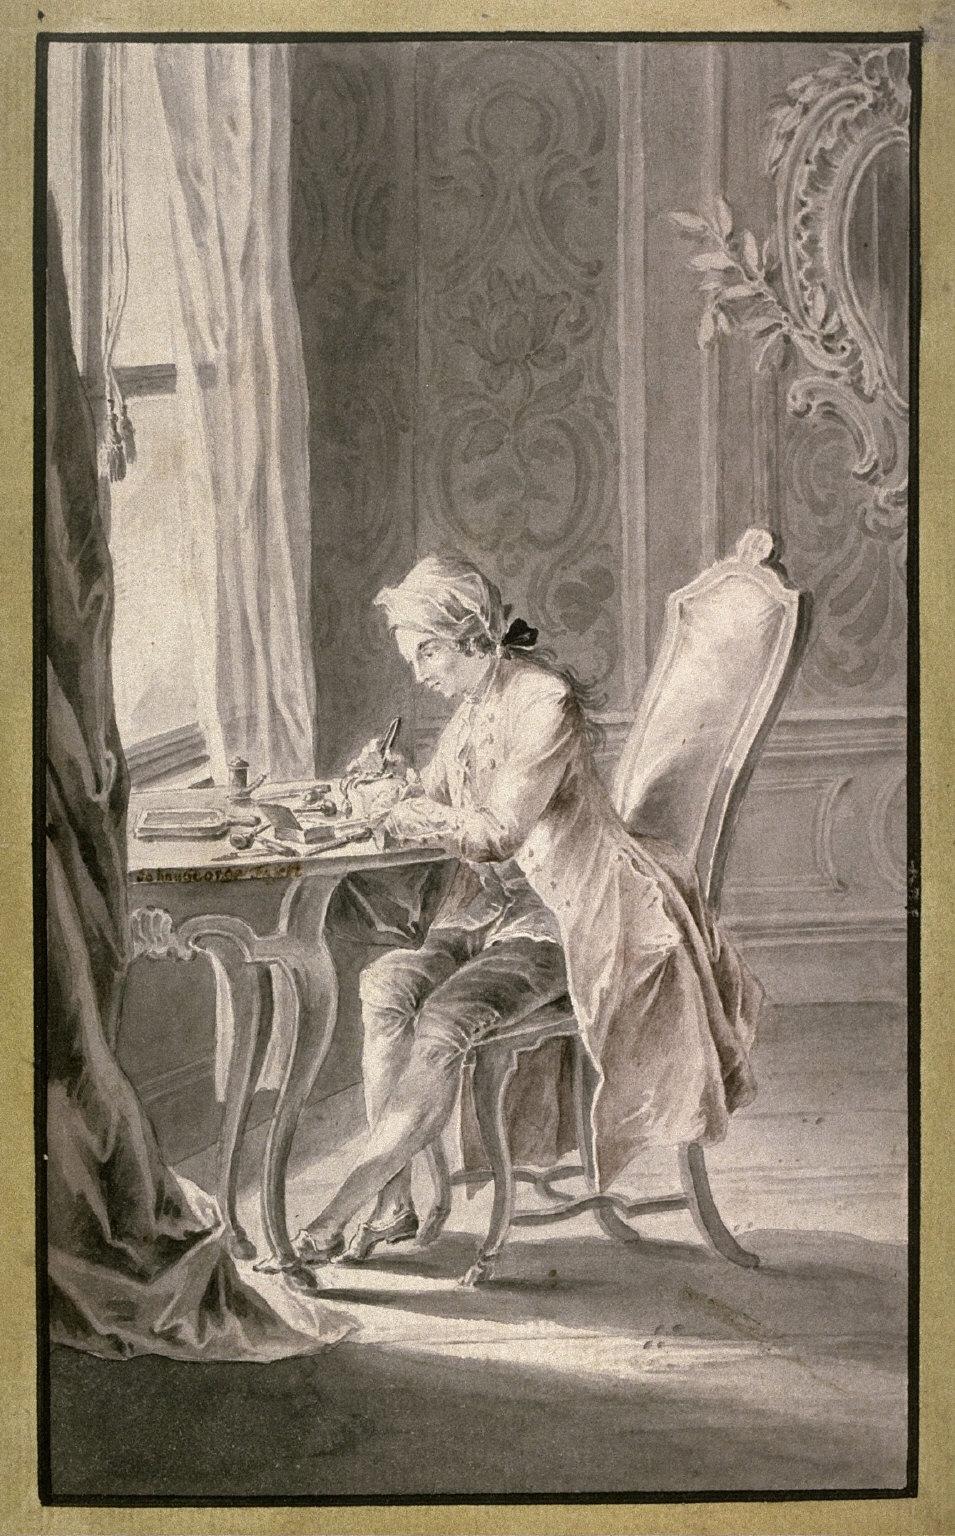 A Gentleman Engraving a Plate